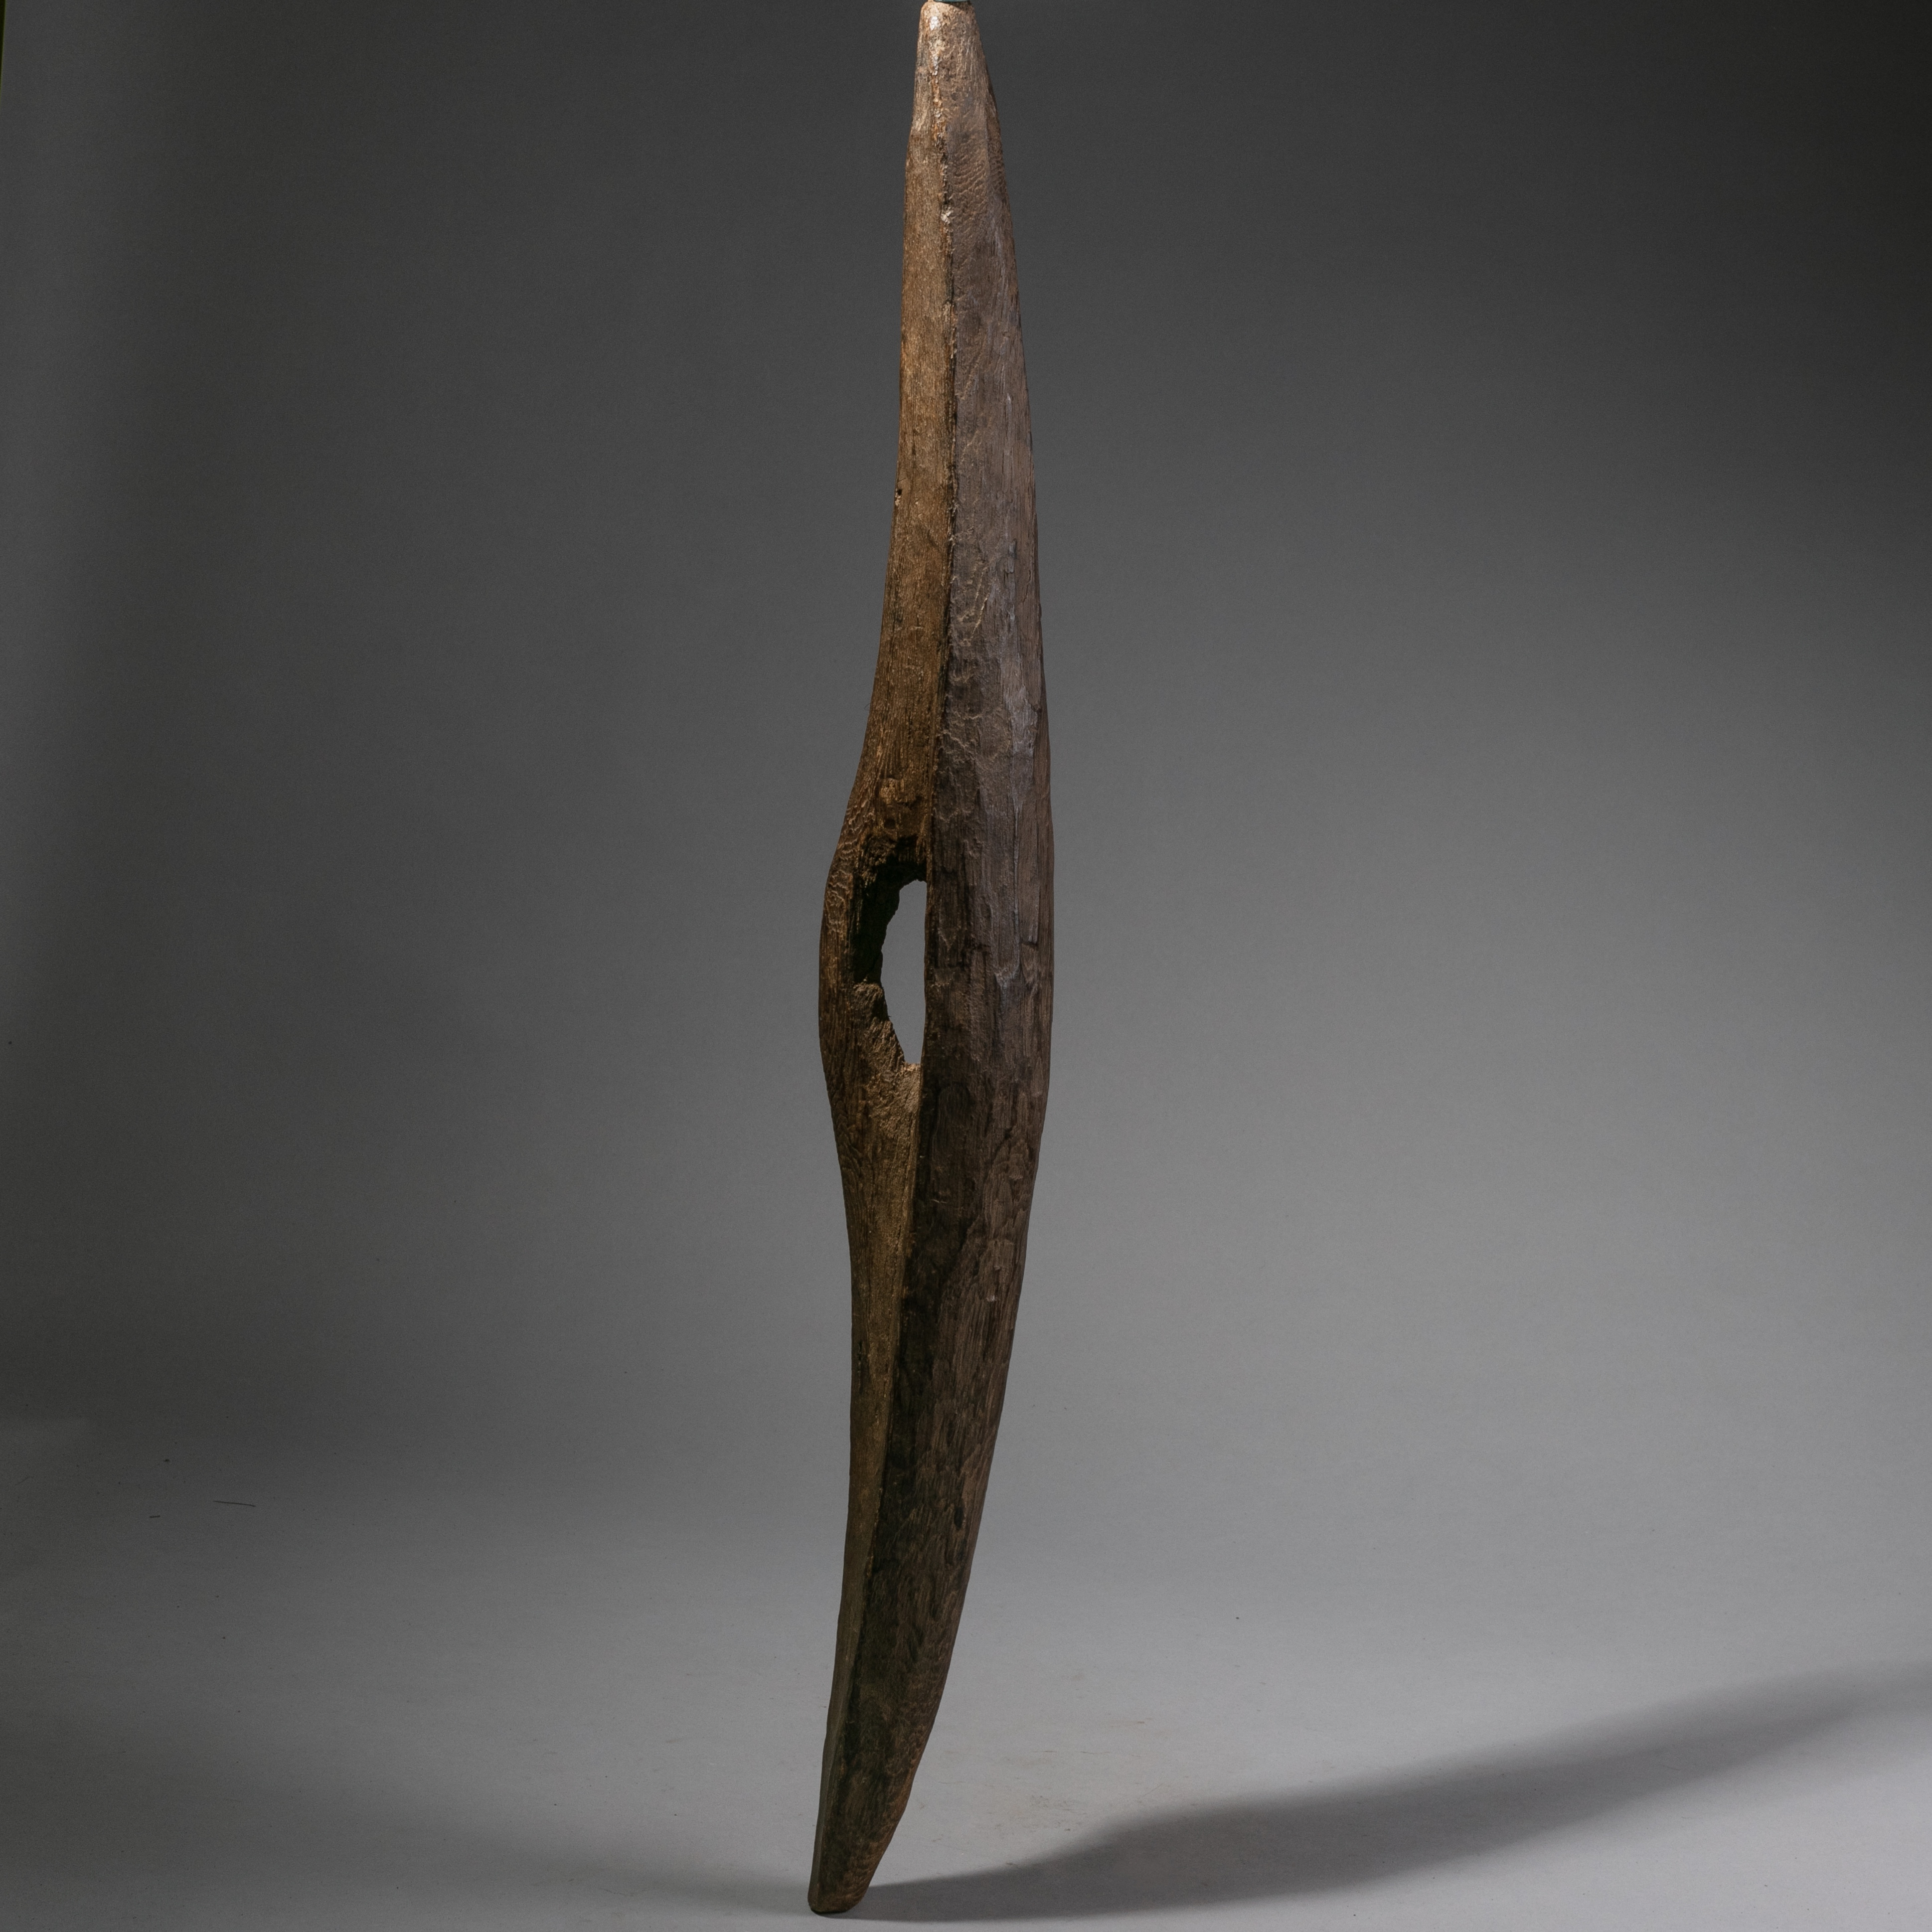 AN ELEMENTAL WOODEN SHIELD FROM THE SHI TRIBE UGANDA ( No 1018 )